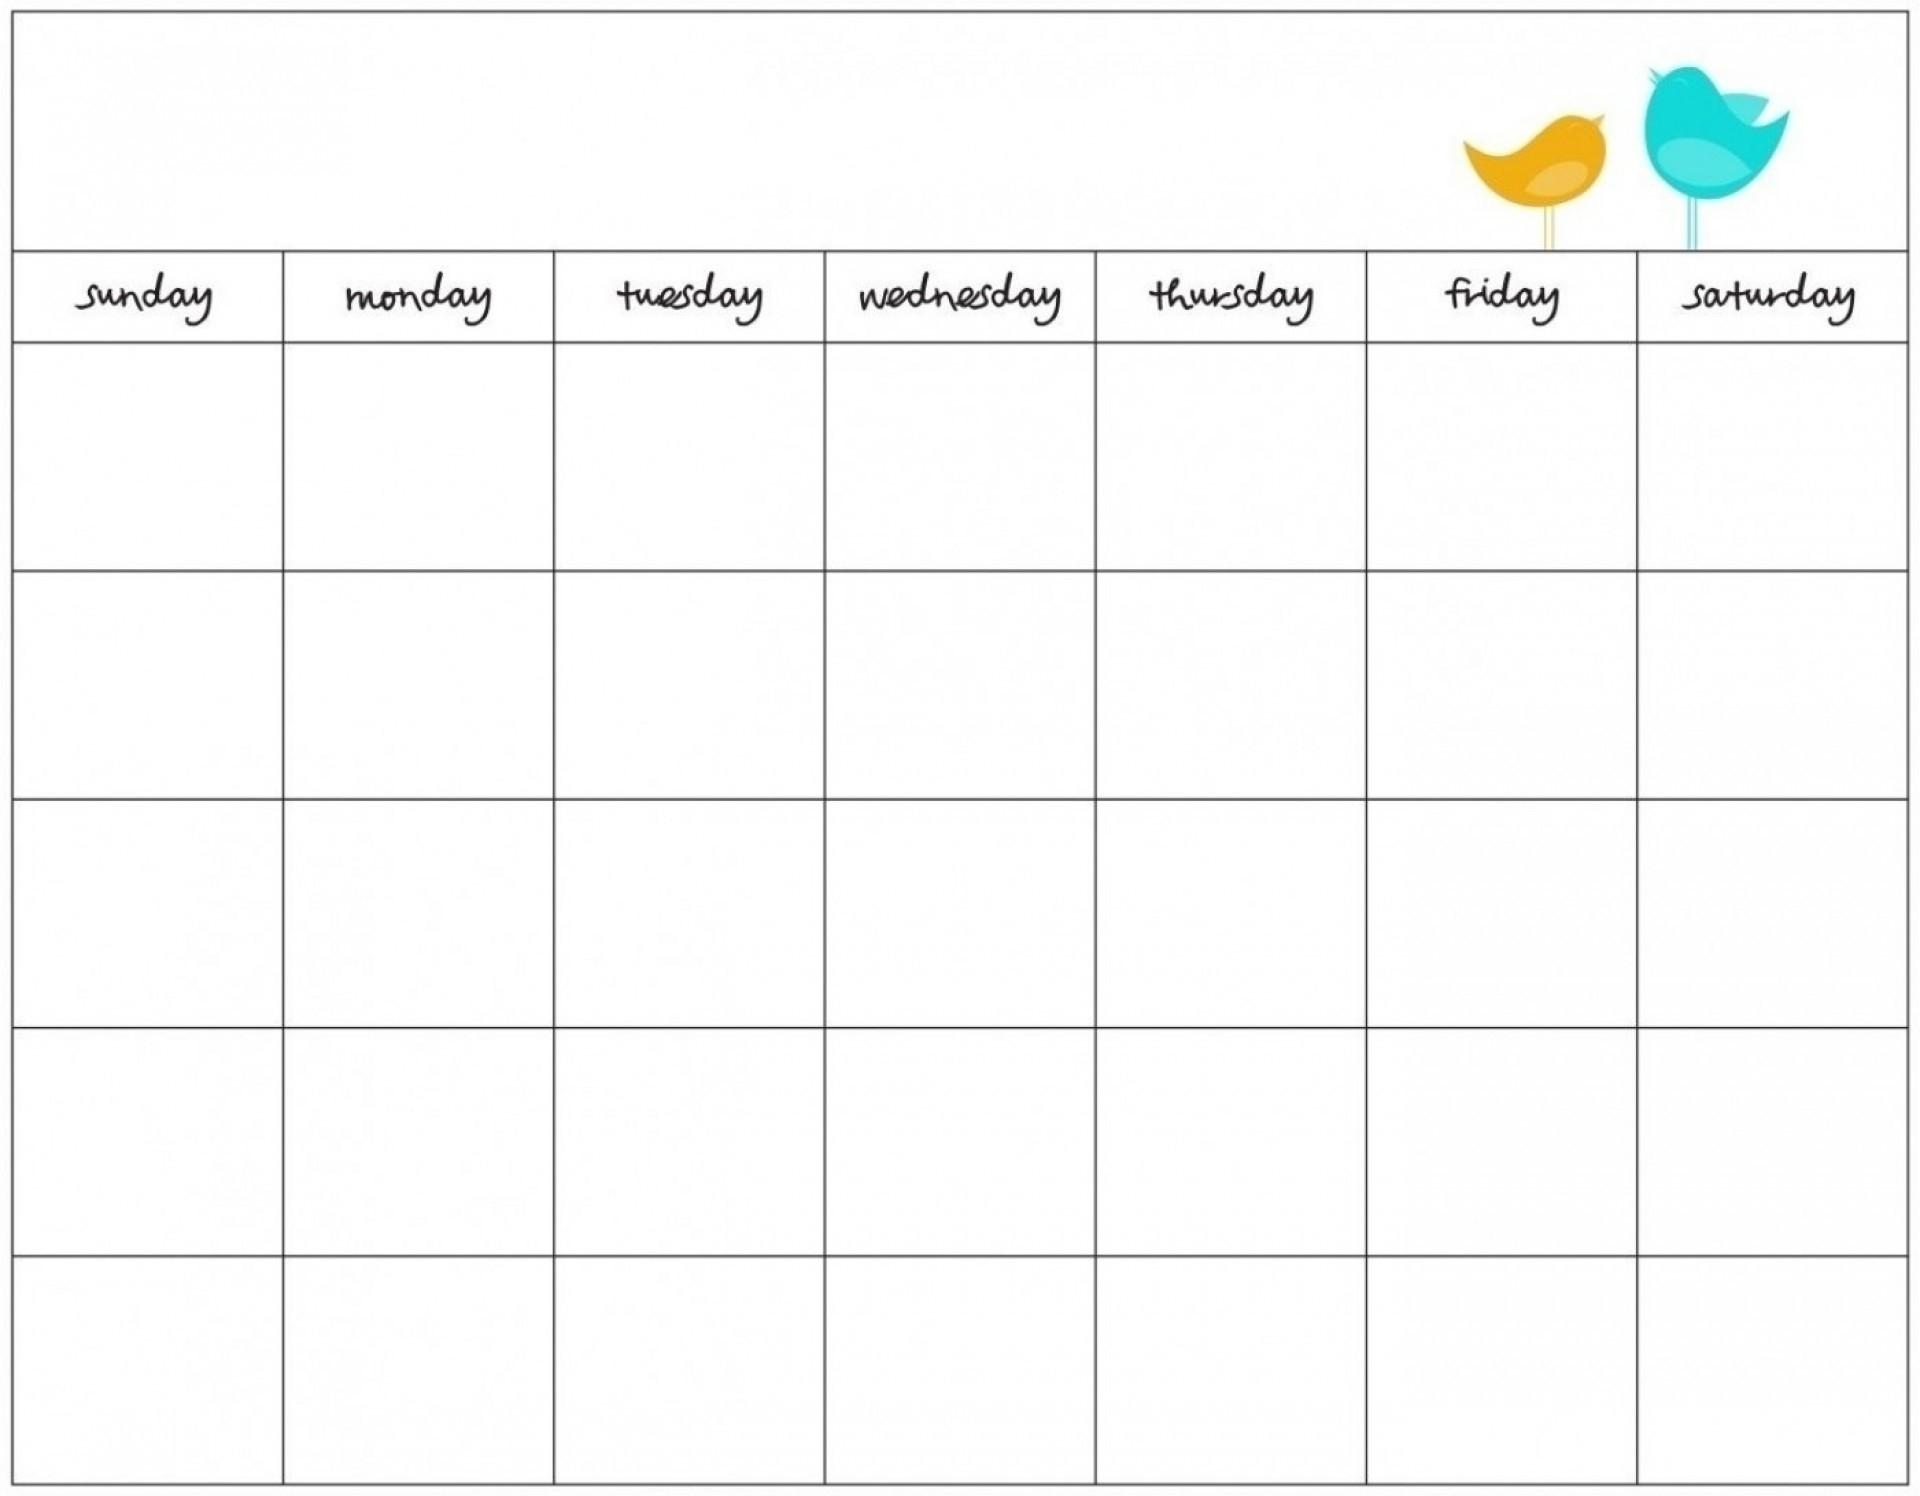 Blank 7 Day Calendar To Print | Free Calendar Template Example-Blank 7 Day Calendar Template